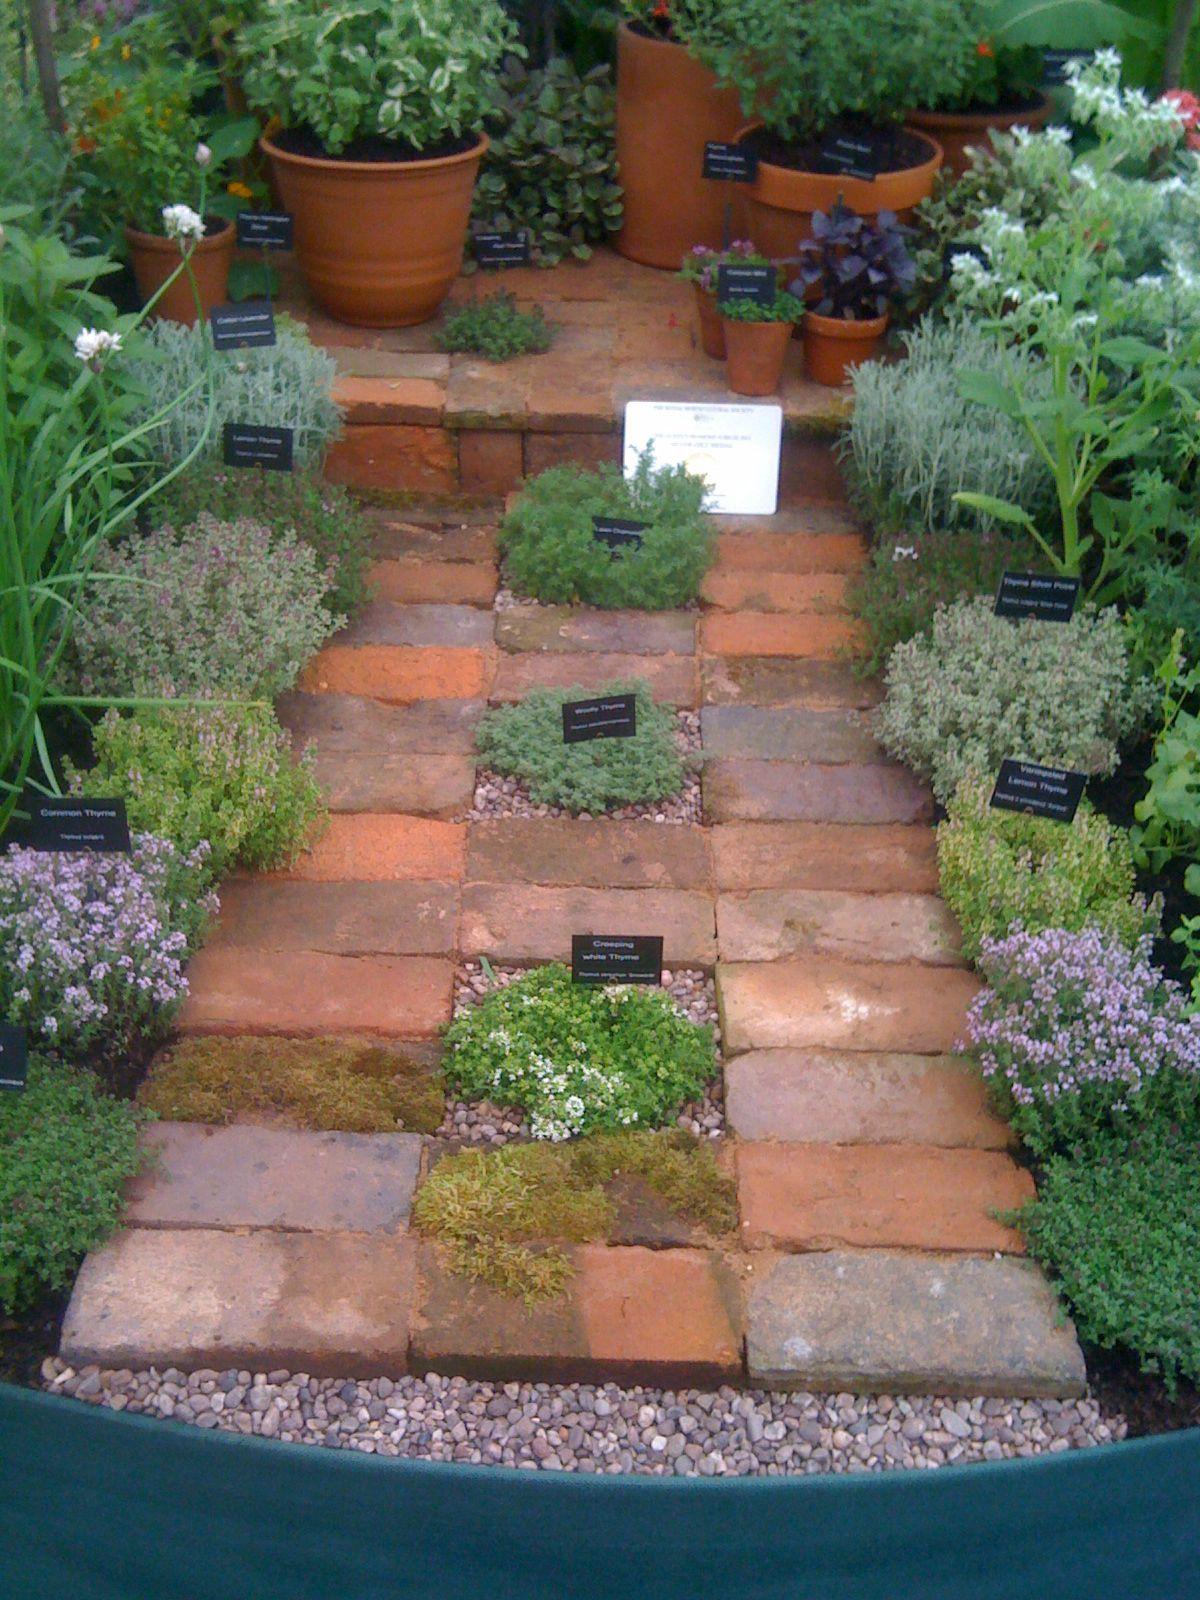 84b2f3c82ca54525fe5ca85fa28f968e - What Zone Is Thunder Bay For Gardening